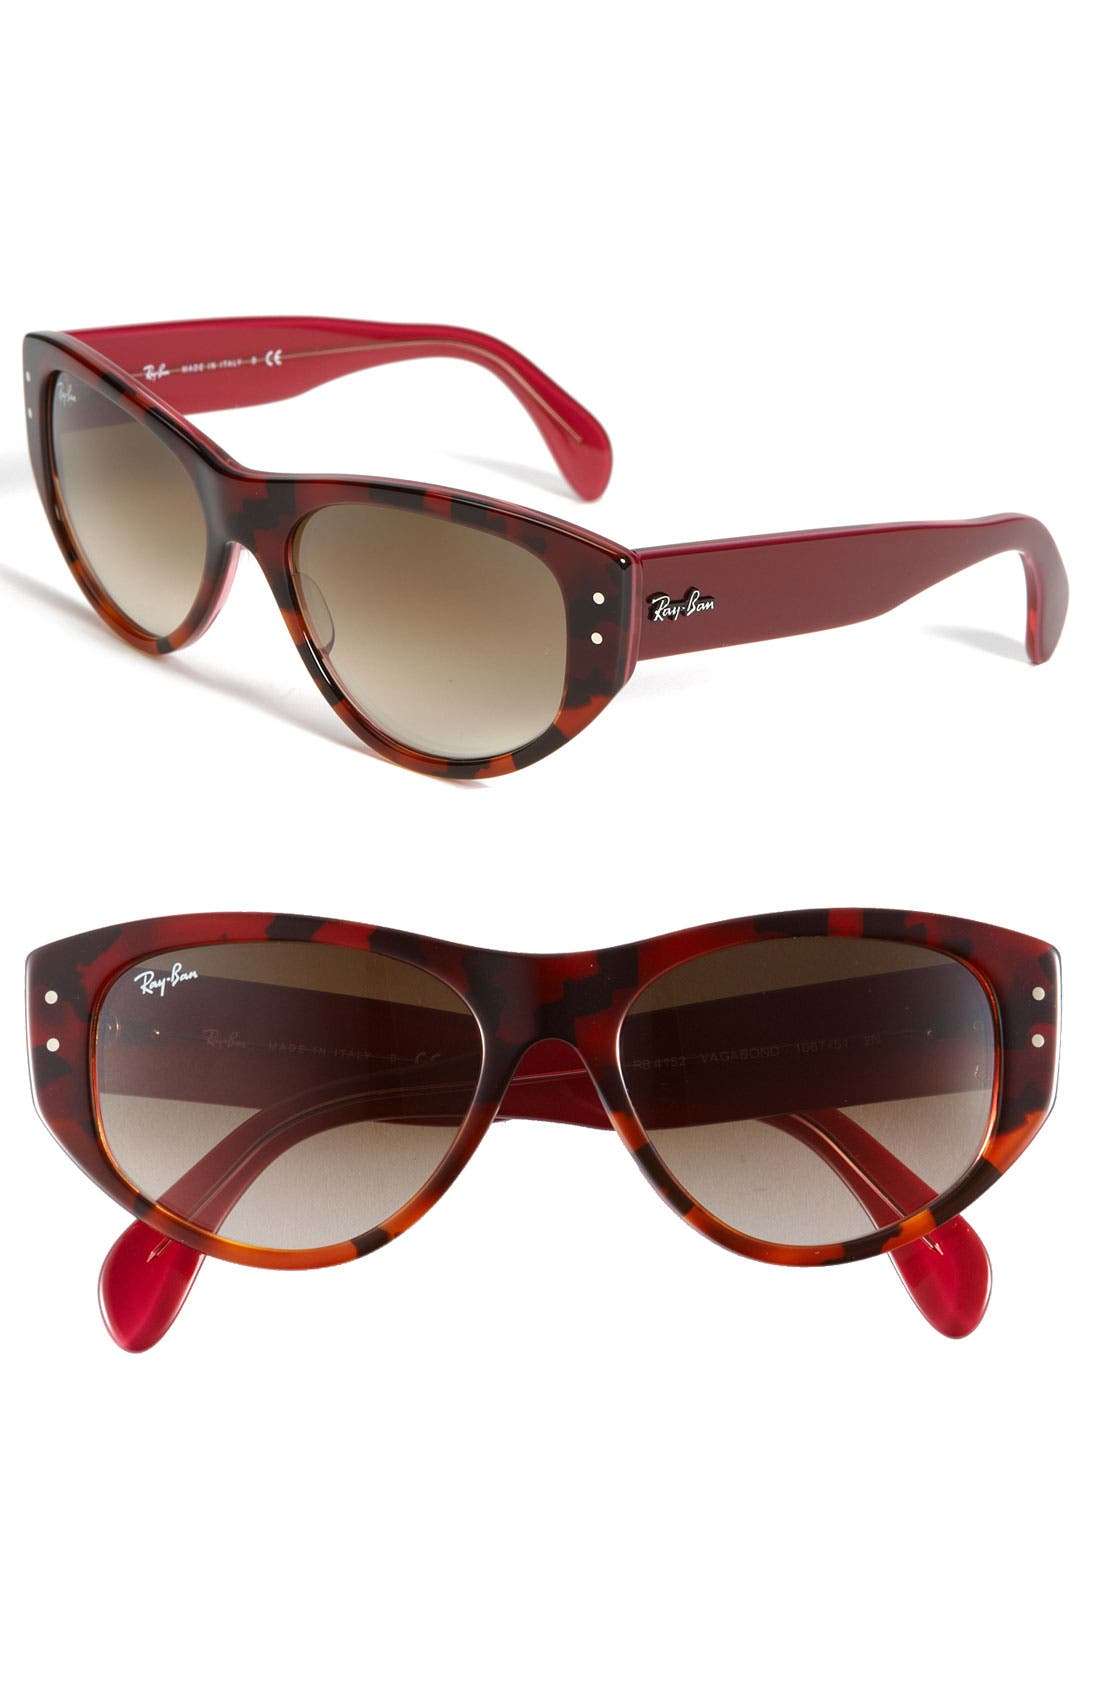 Main Image - Ray-Ban 'Vagabond' Cat's Eye Sunglasses